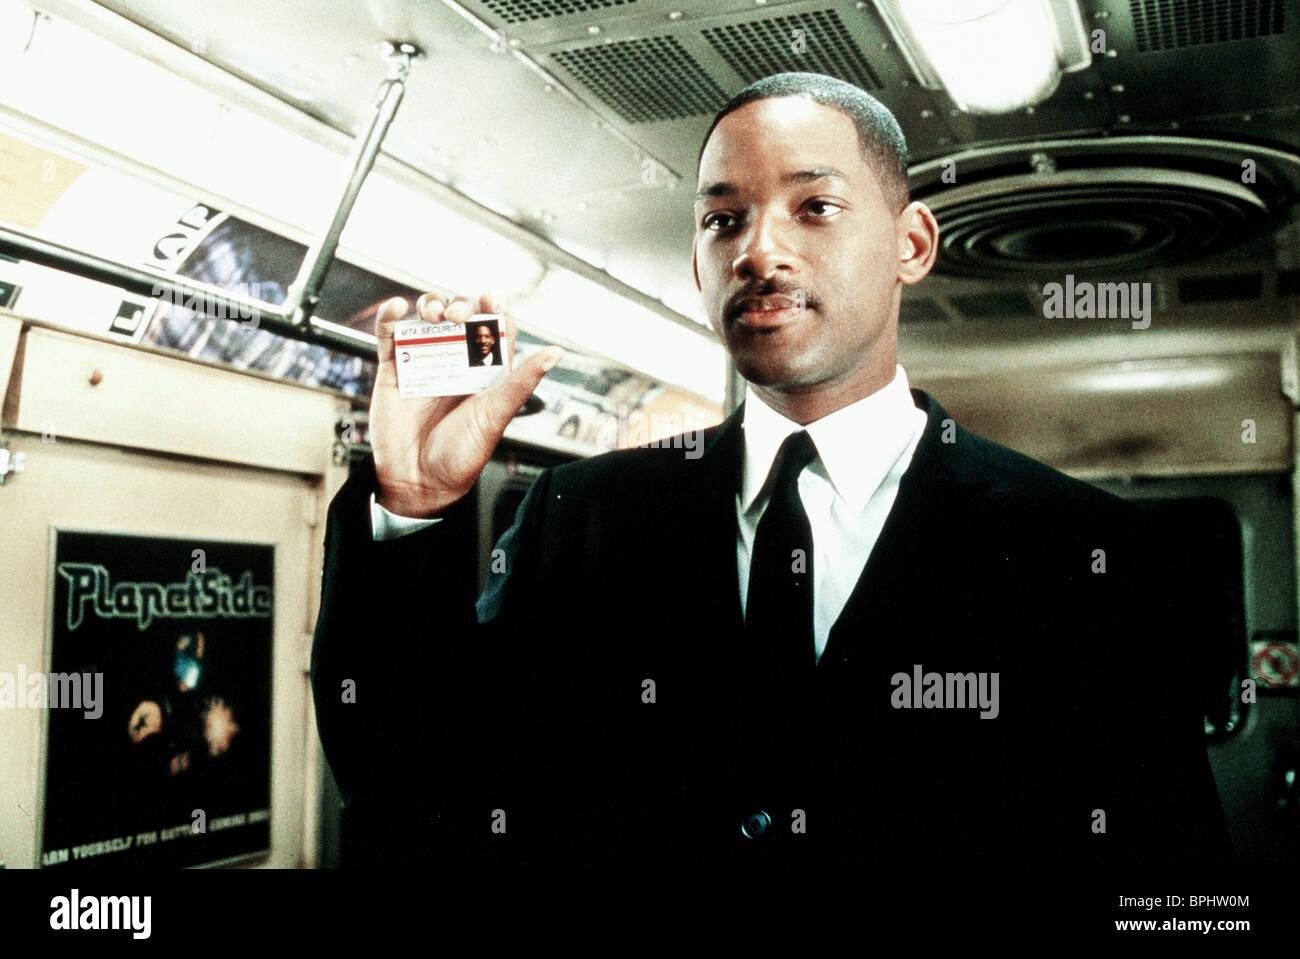 Will Smith Men In Black Ii Mib 2 2002 Stock Photo